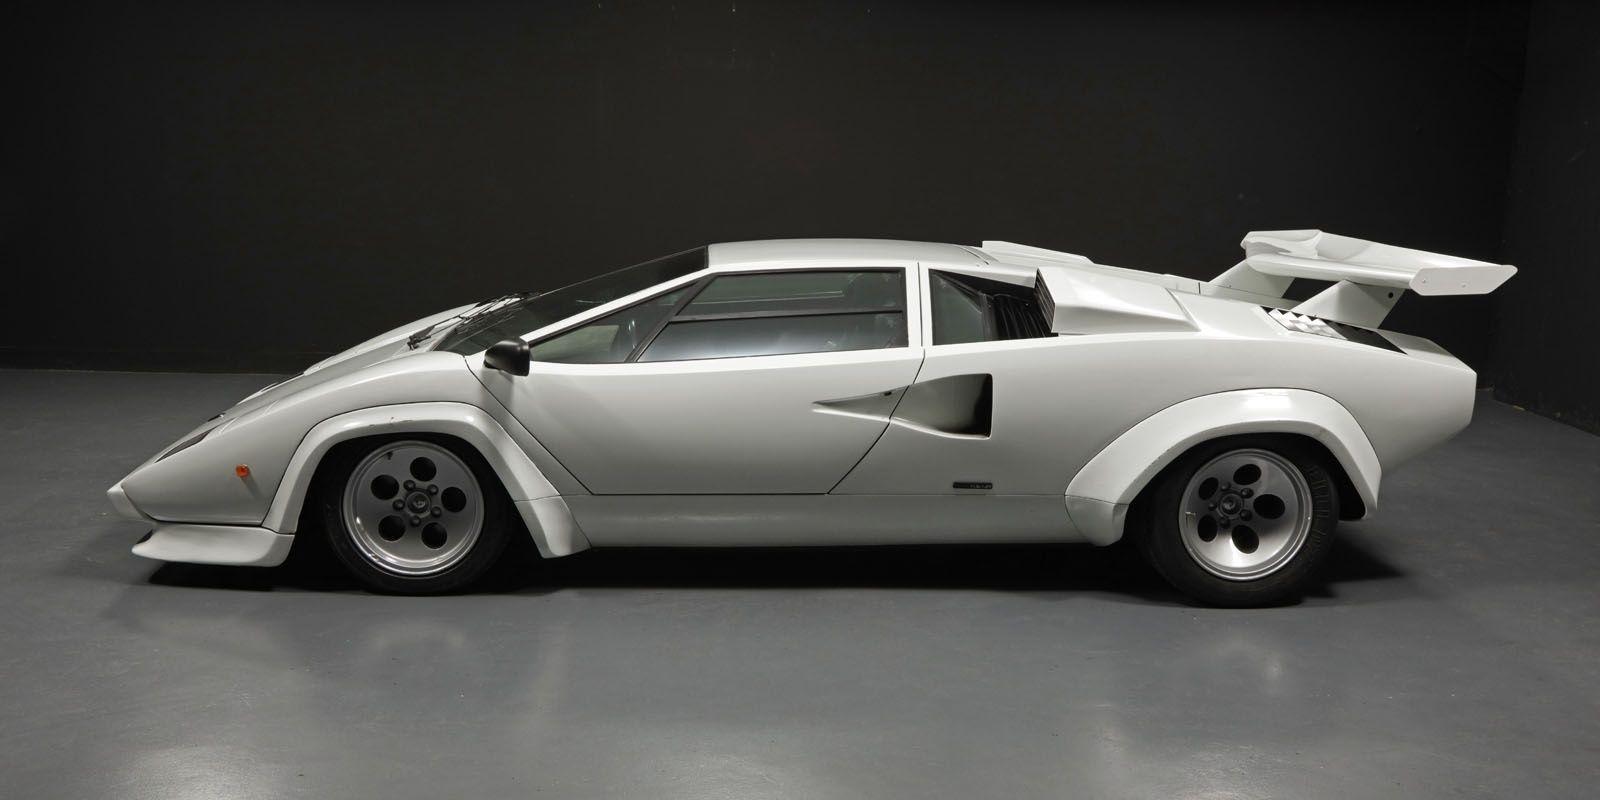 1980 Lamborghini Countach Lp400s Lamborghini Countach